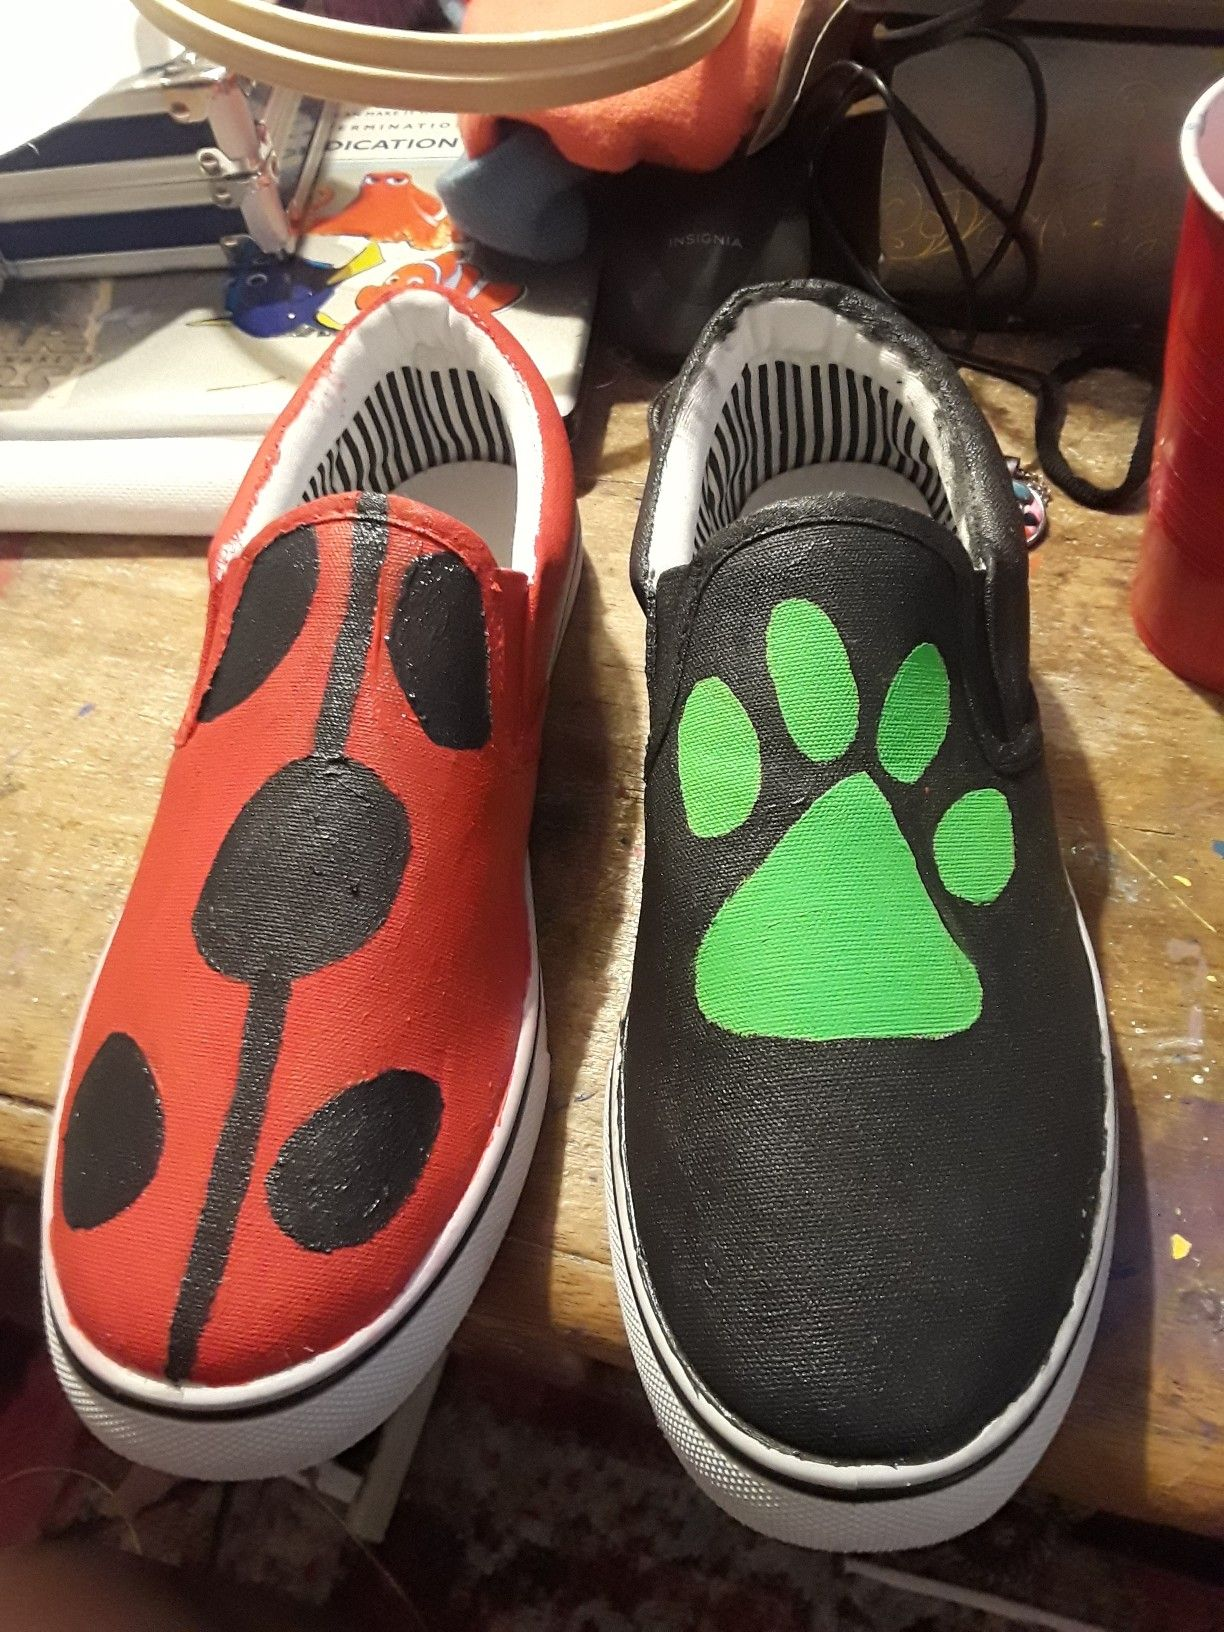 Miraculous ladybug diy shoes